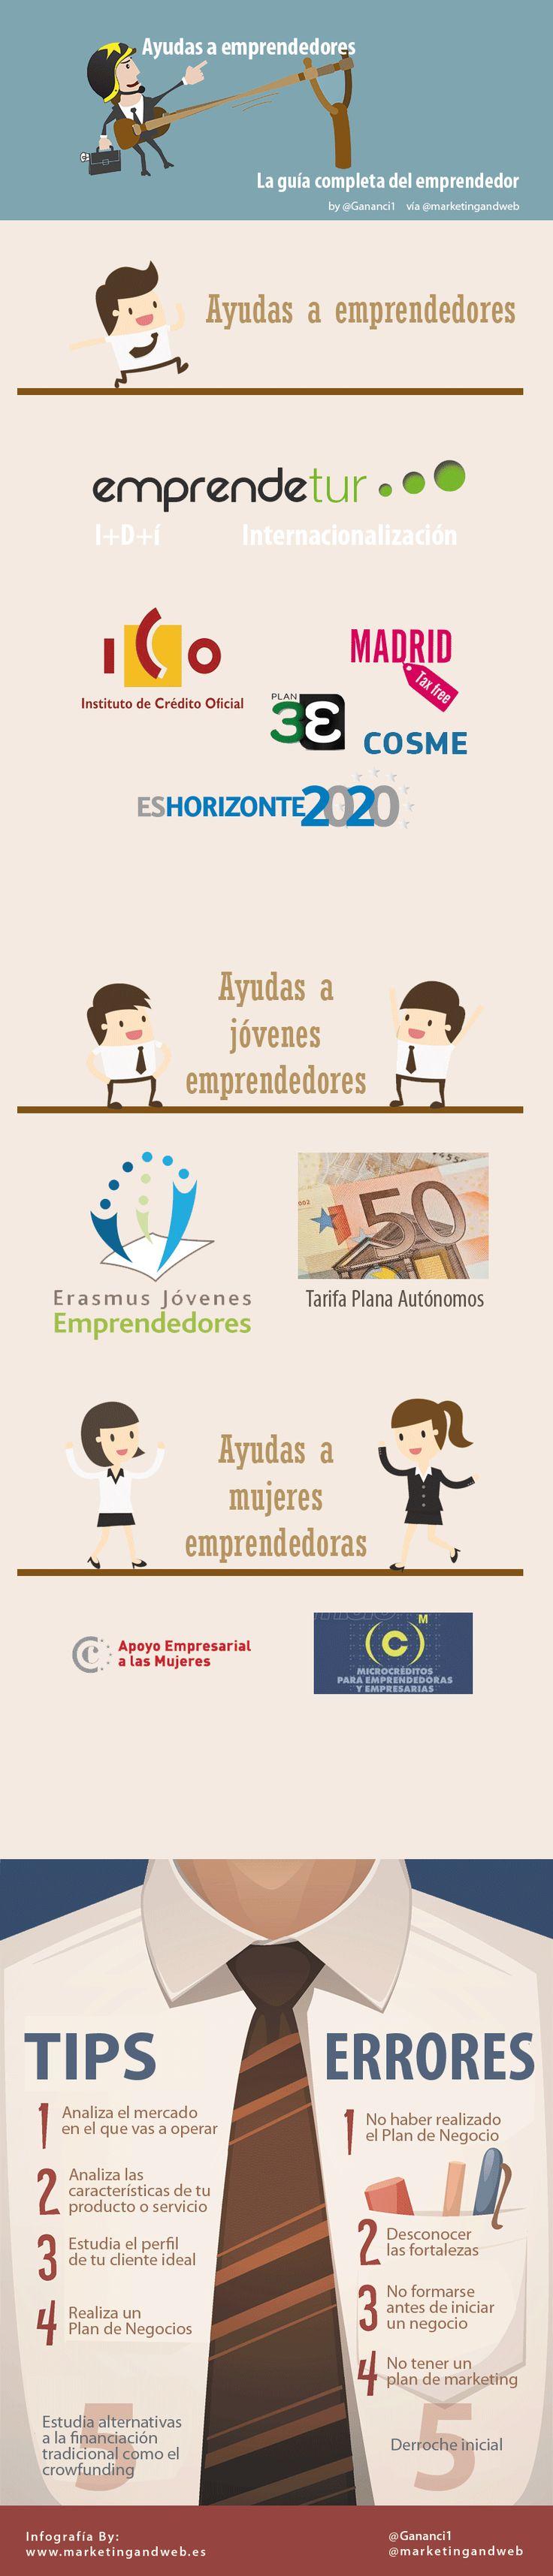 Emprendedores: ayudas – consejos – errores #infografia #infographic #entrepreneurship